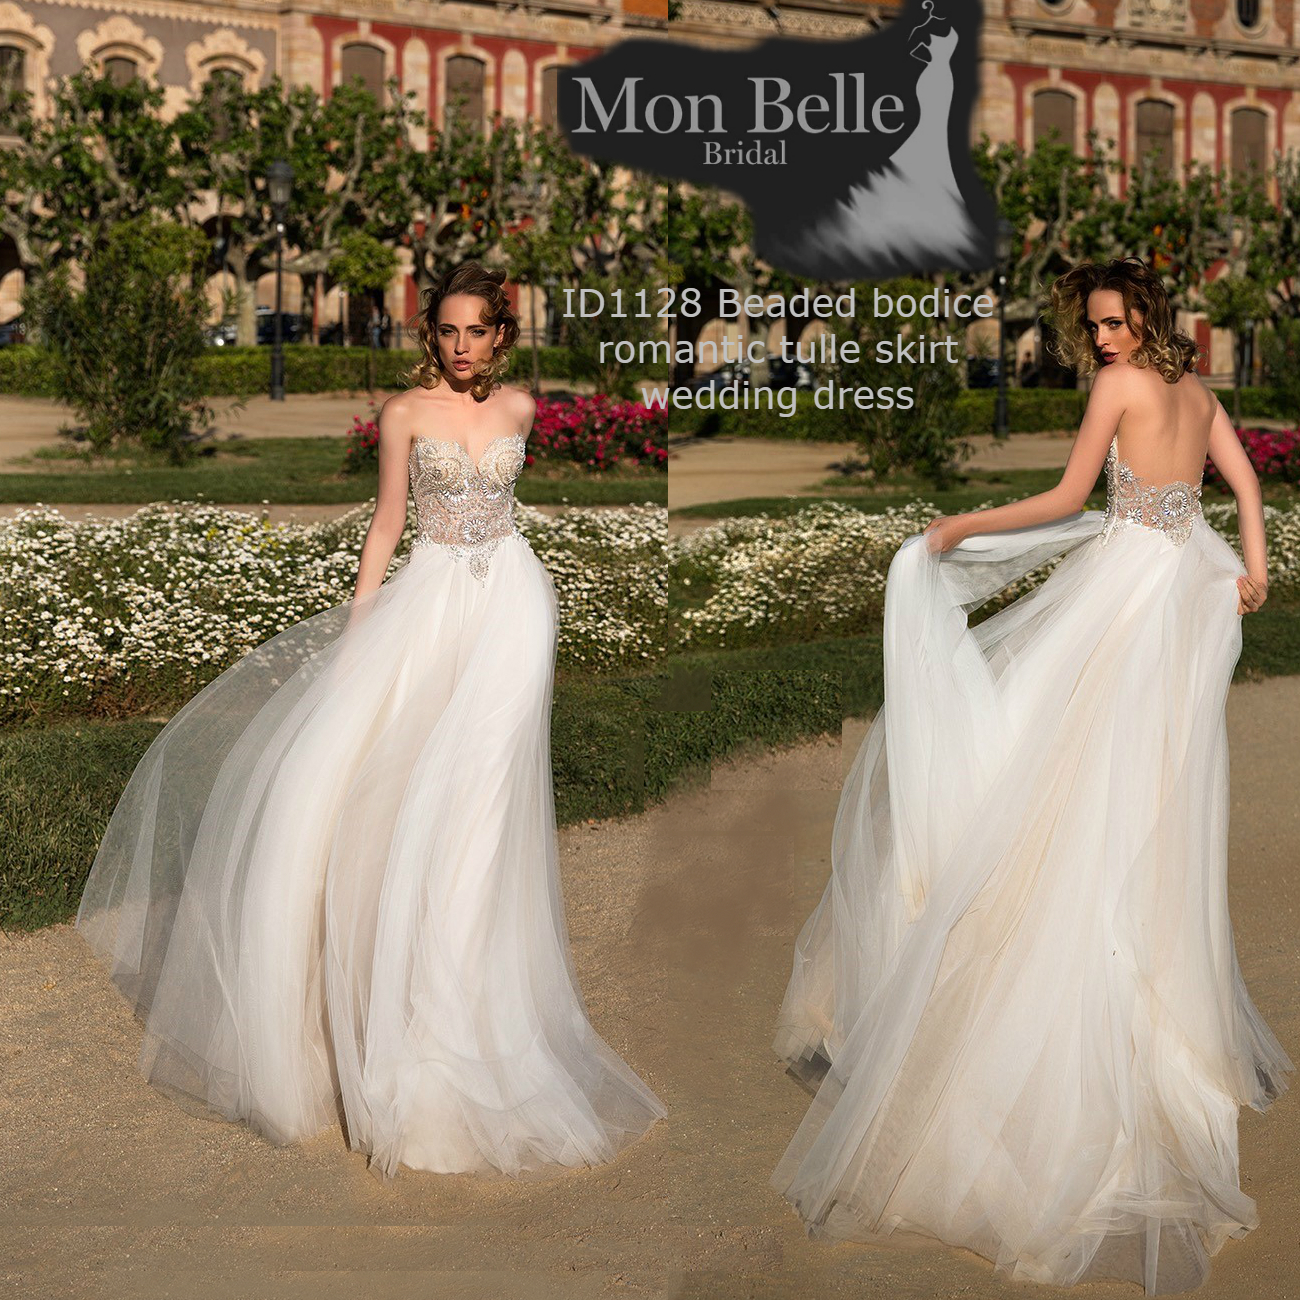 Bodice Wedding Gown: ROMANCE Beautiful Beaded Bodice Soft Tulle Skirt Wedding